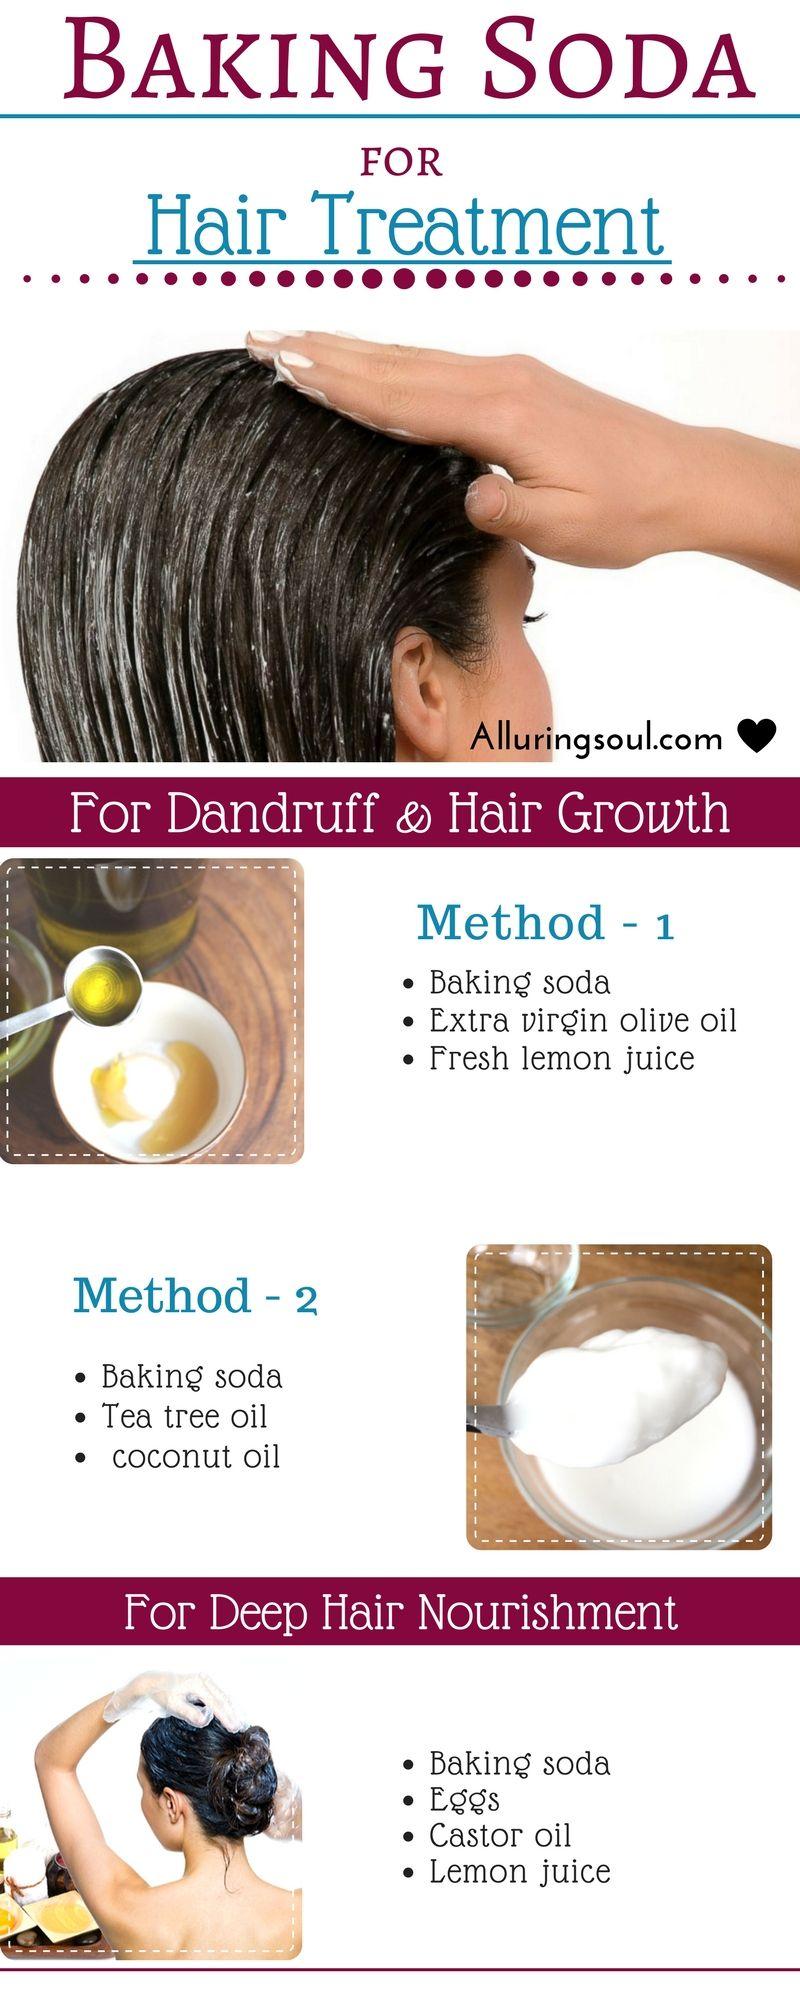 Baking Soda For Face And Hair Baking Soda For Hair Scalp